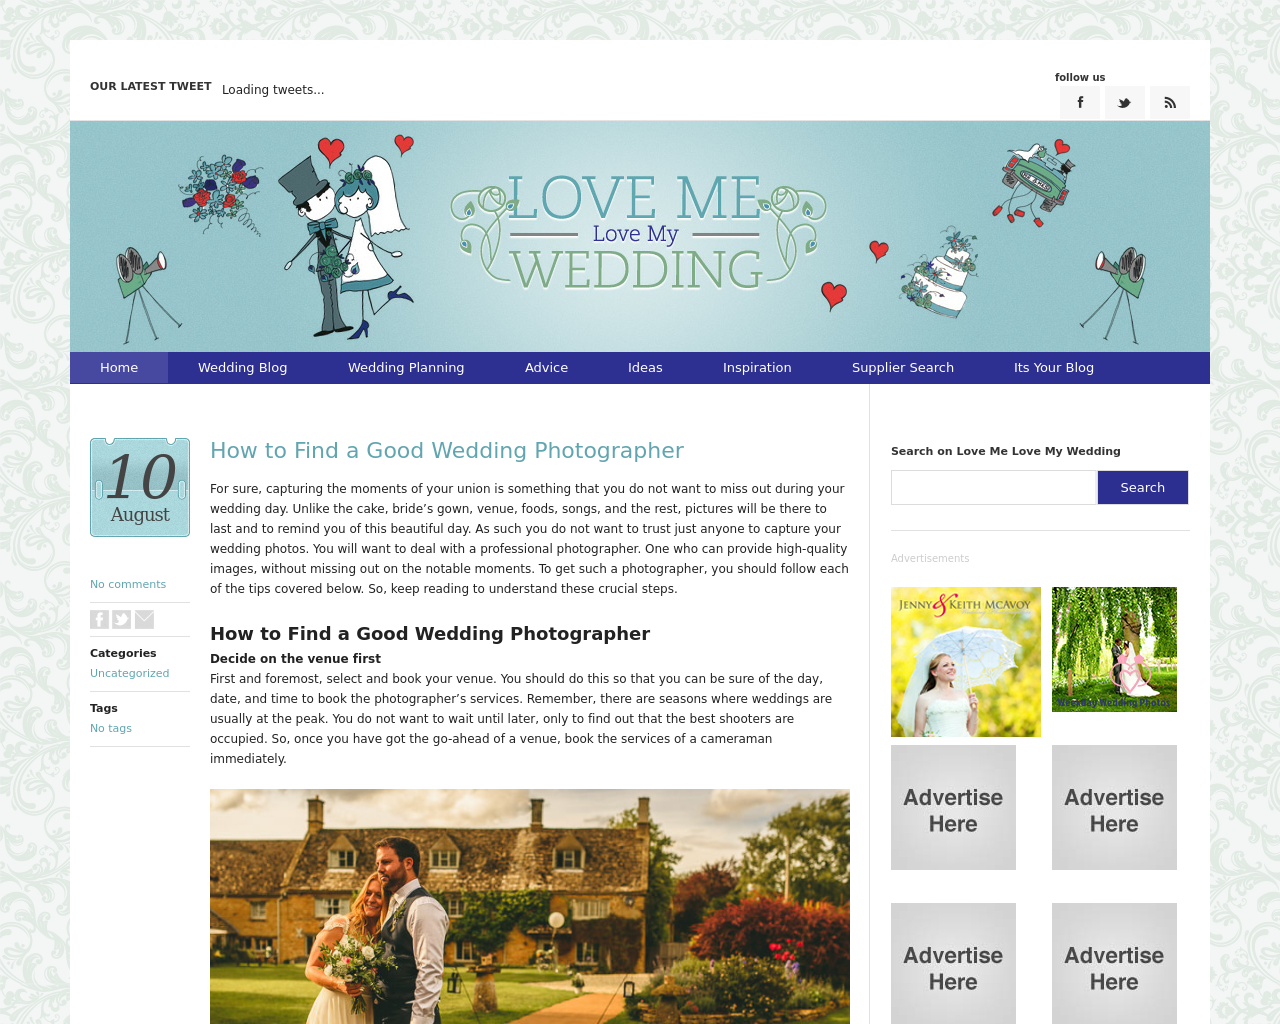 LoveMeLoveMyWedding-Advertising-Reviews-Pricing